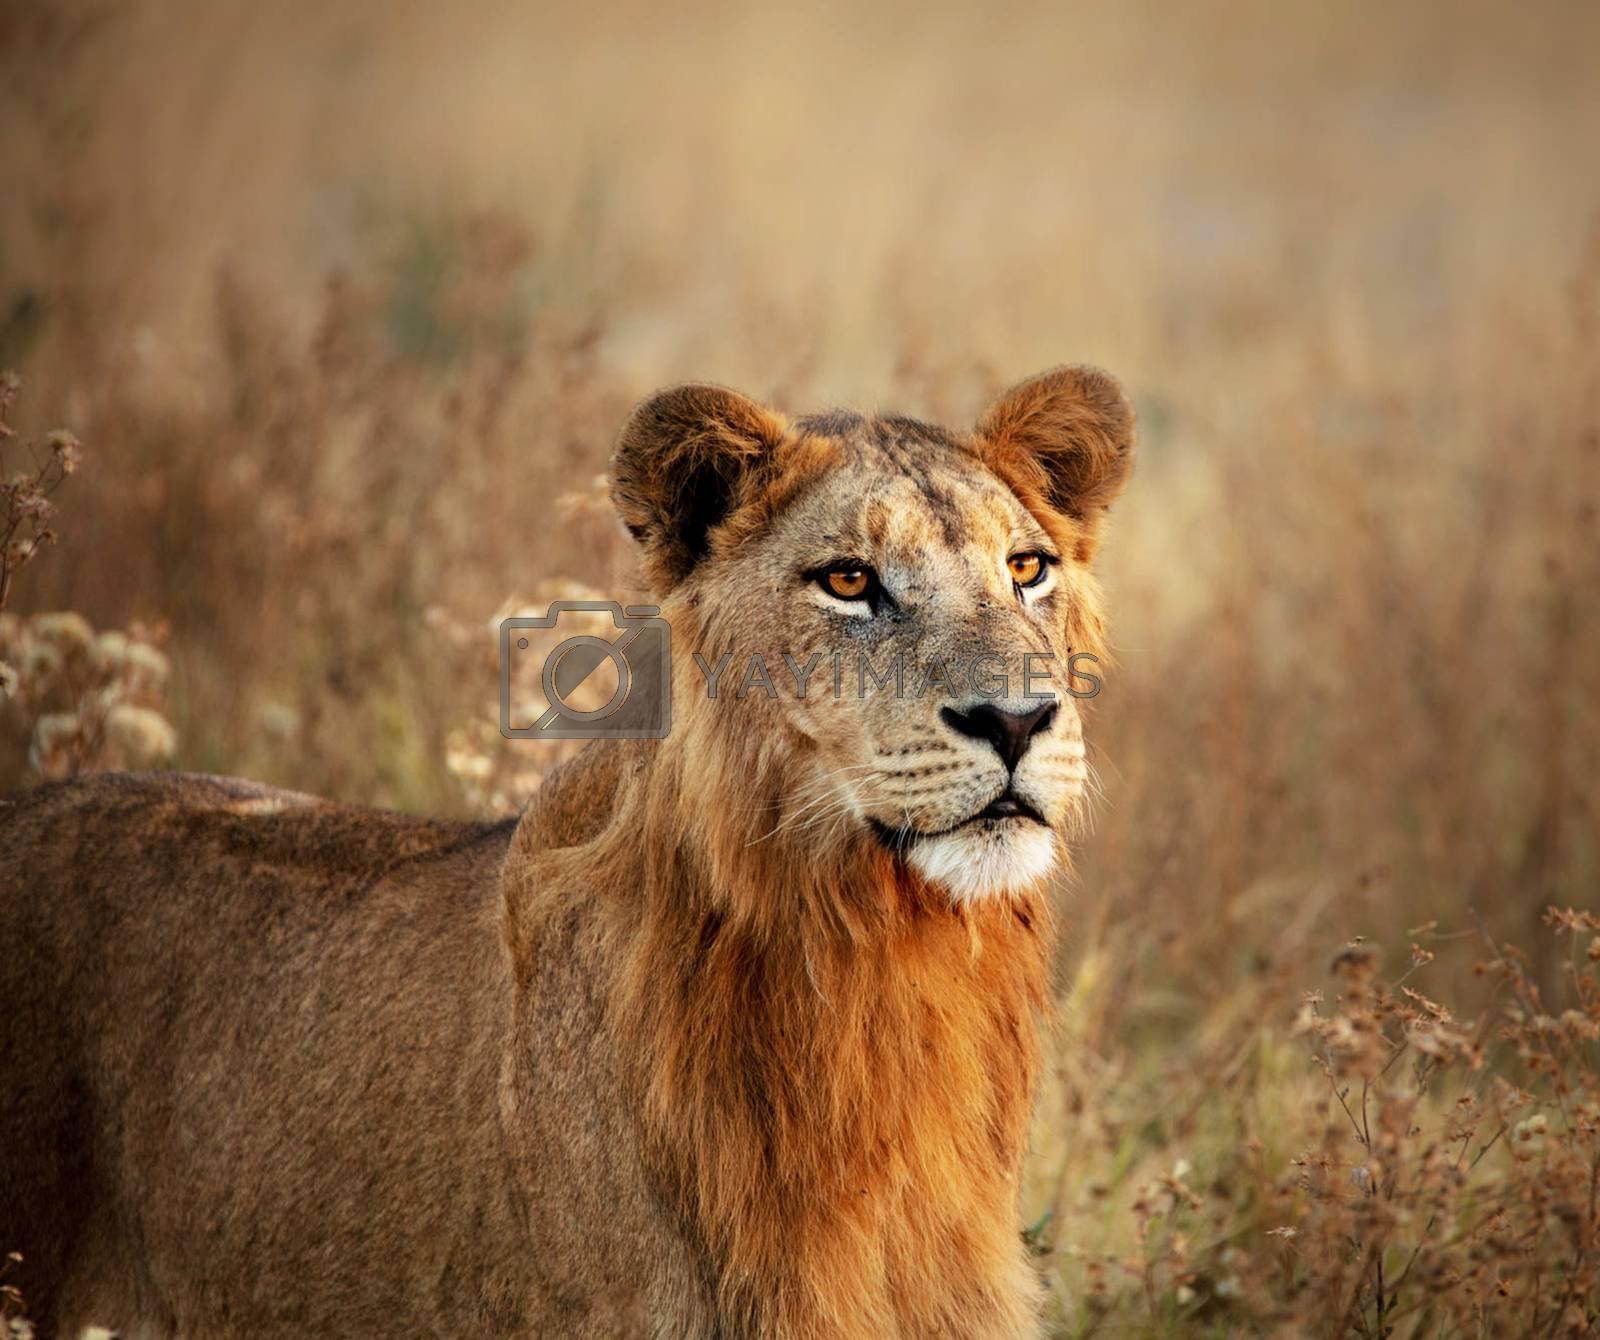 Beautiful pictures of Wildlife